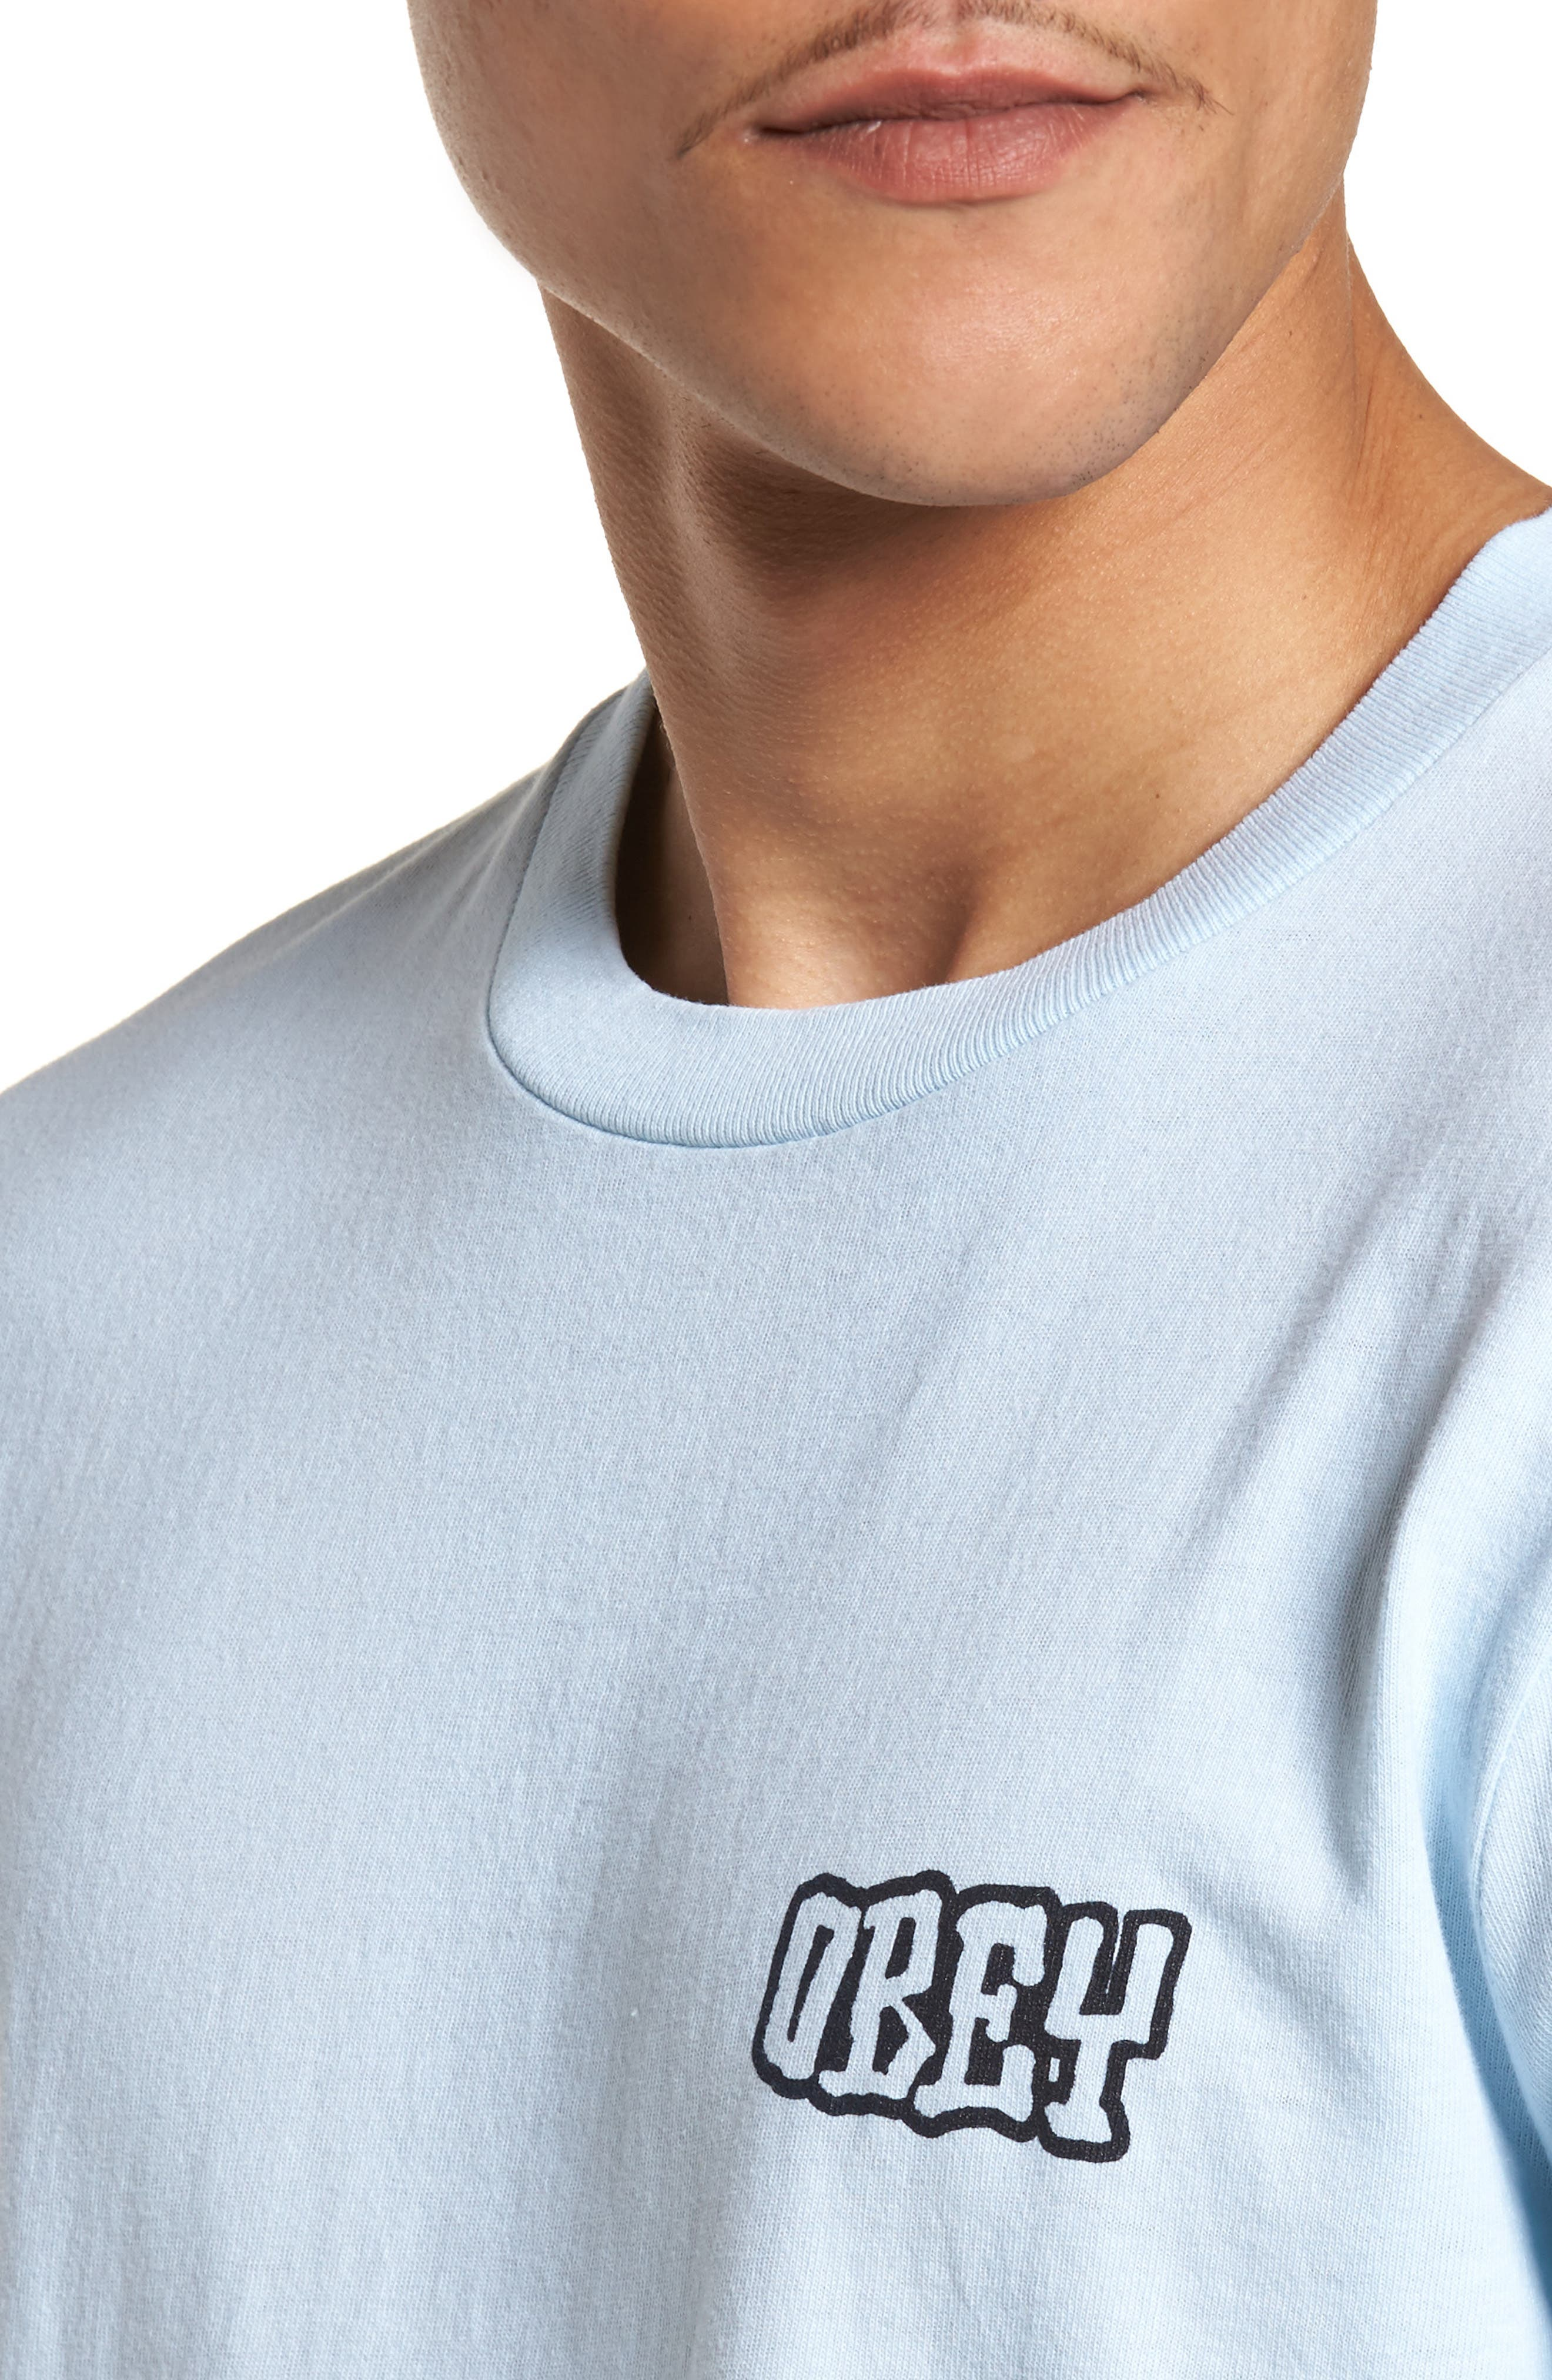 Unwritten Future Graphic T-Shirt,                             Alternate thumbnail 4, color,                             Dusty Blue